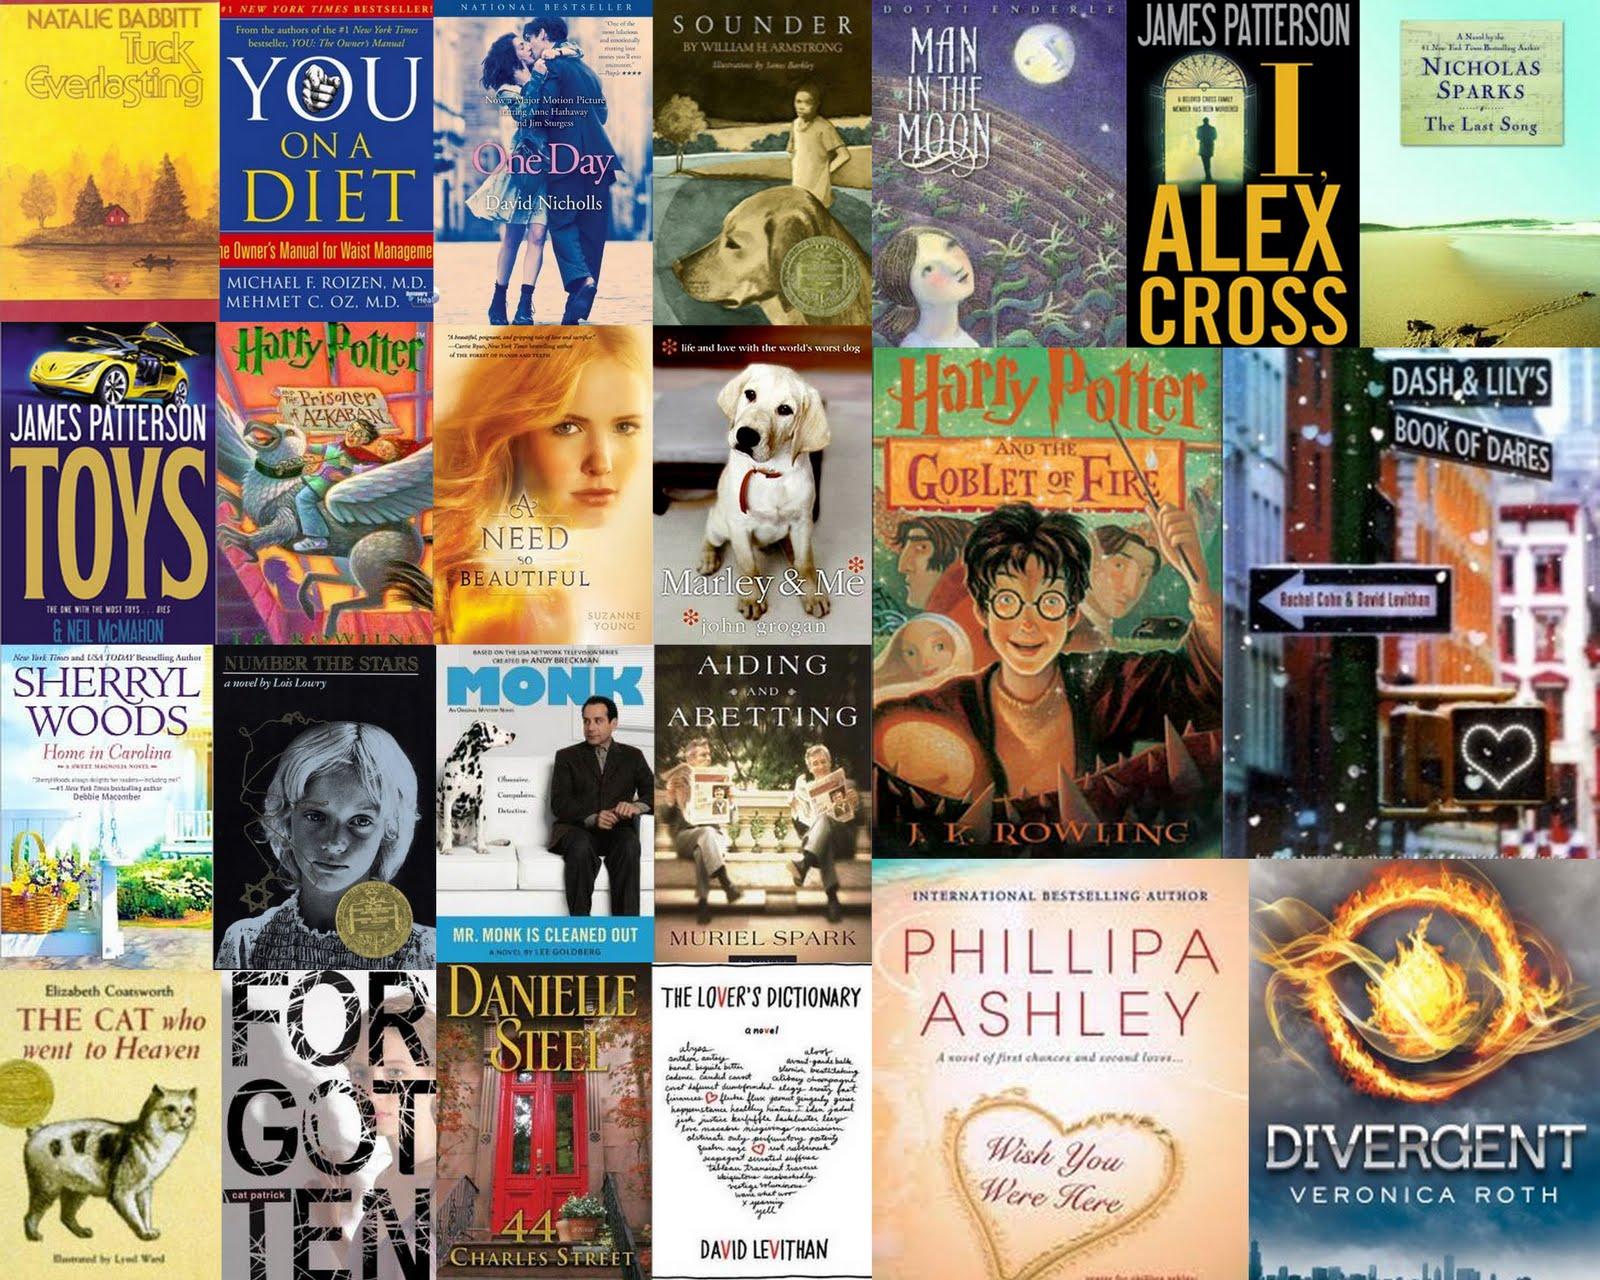 Books collage photo